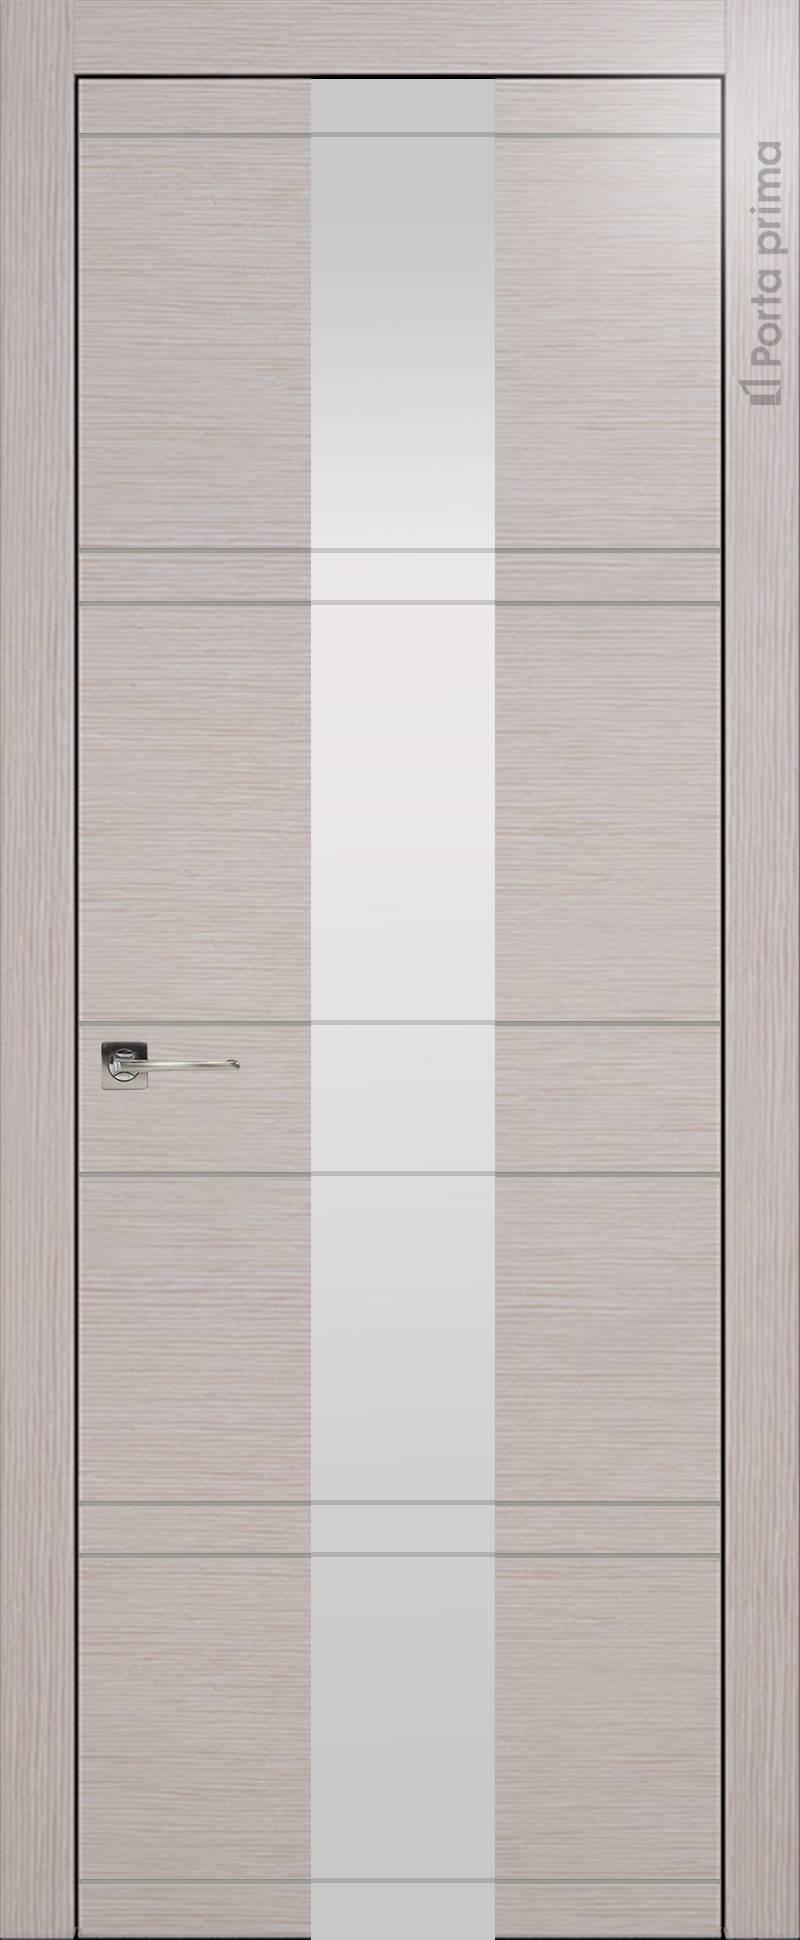 Tivoli Ж-2 цвет - Дымчатый дуб Со стеклом (ДО)